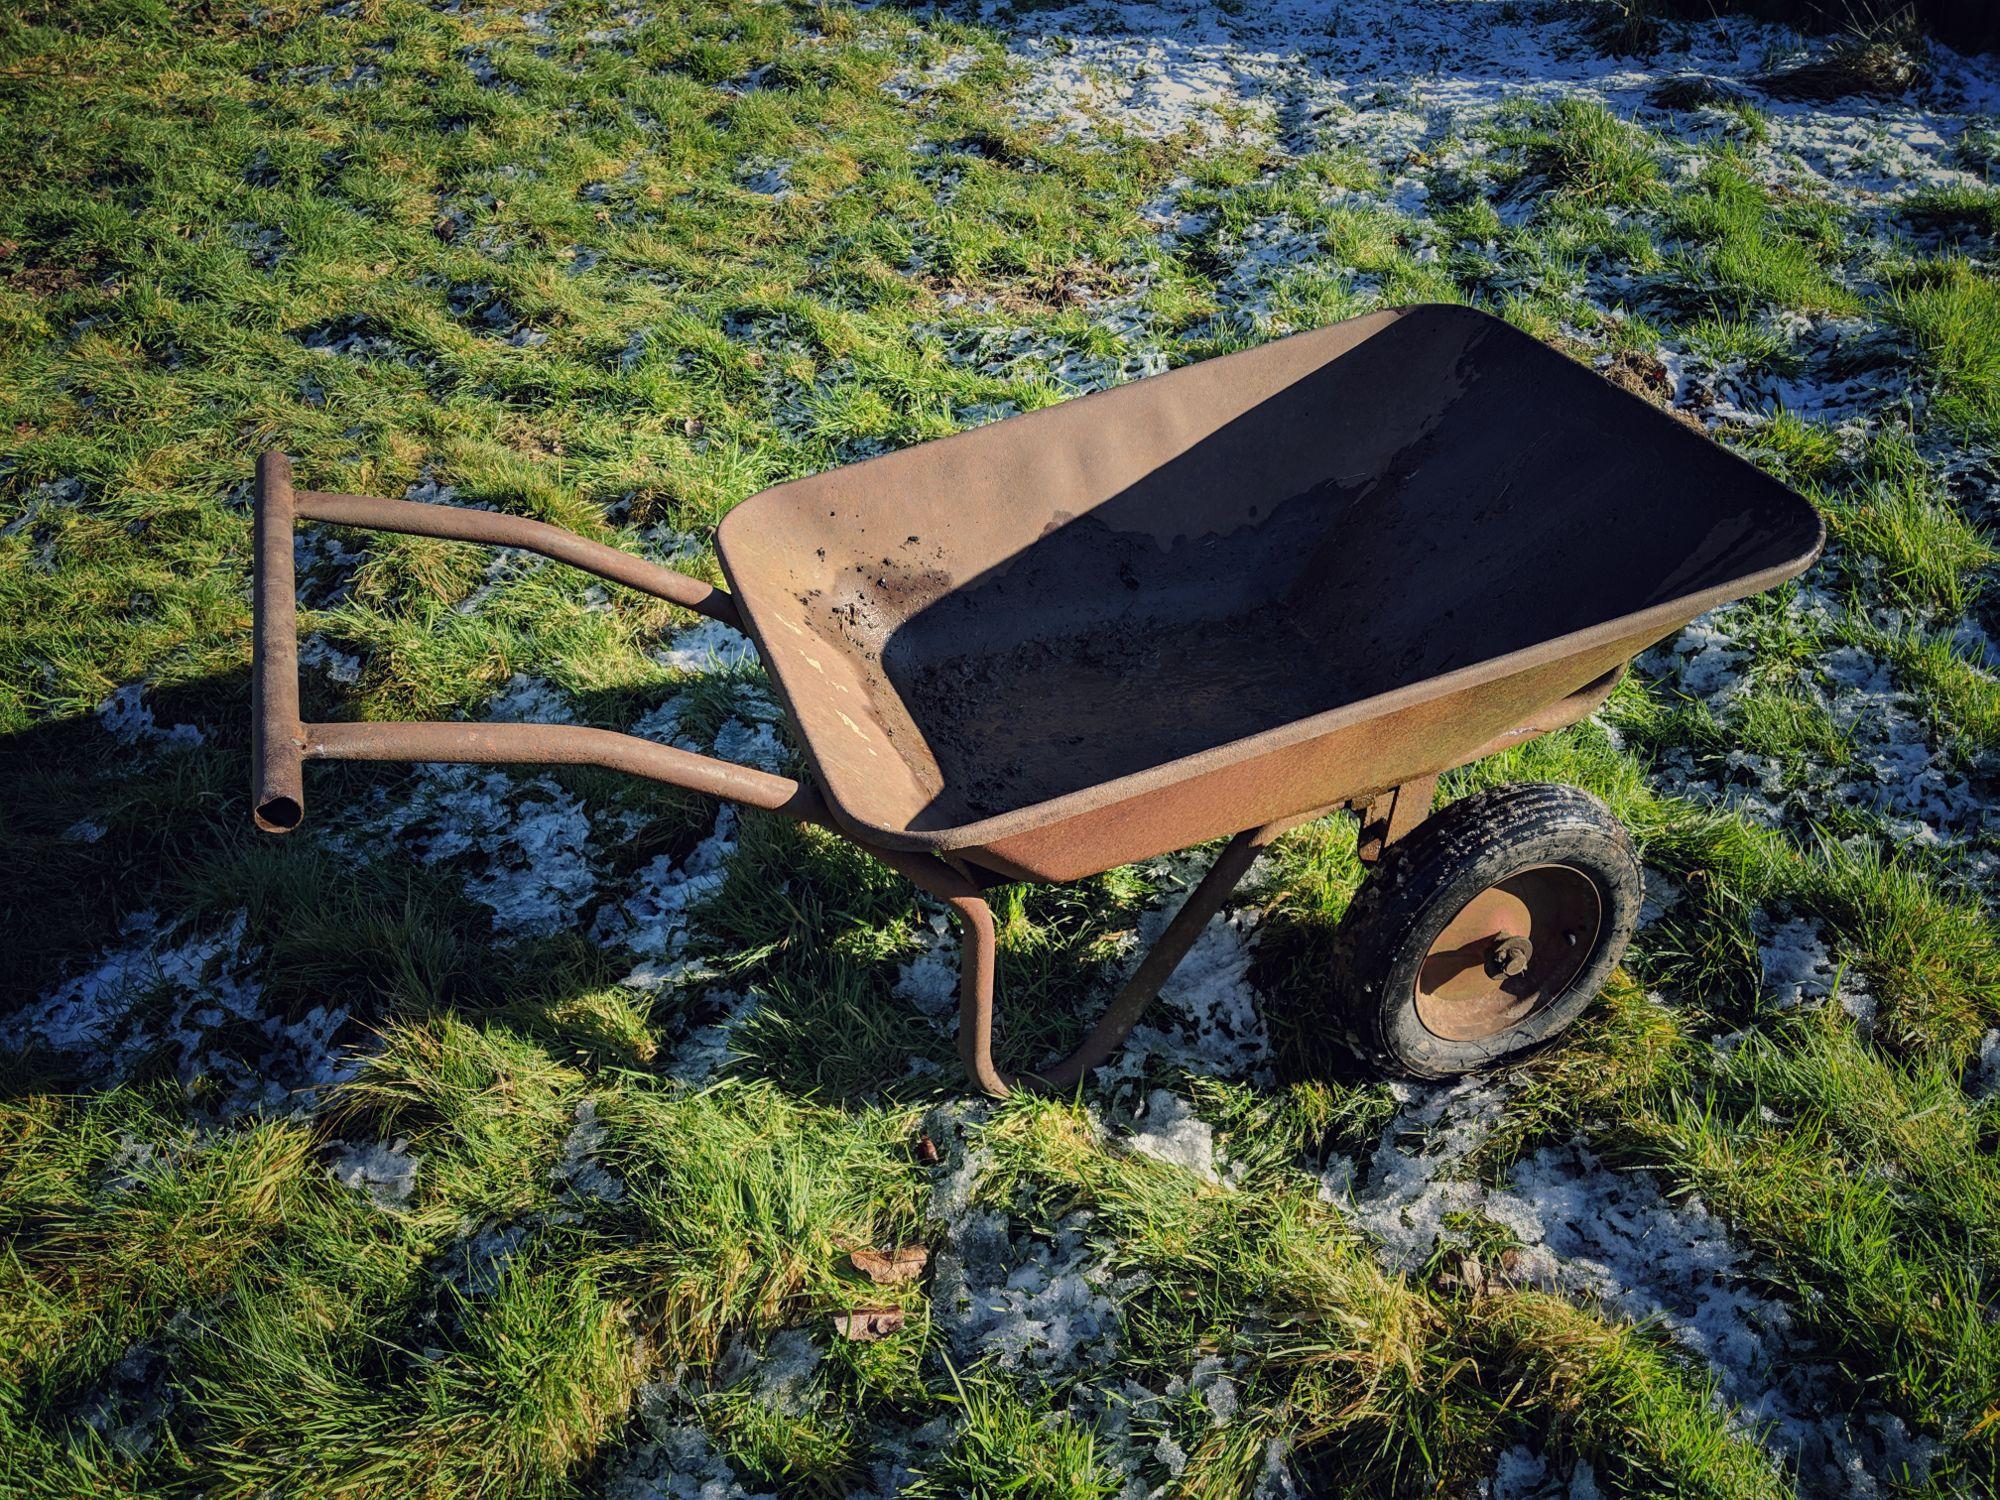 old-wheelbarrow.jpg